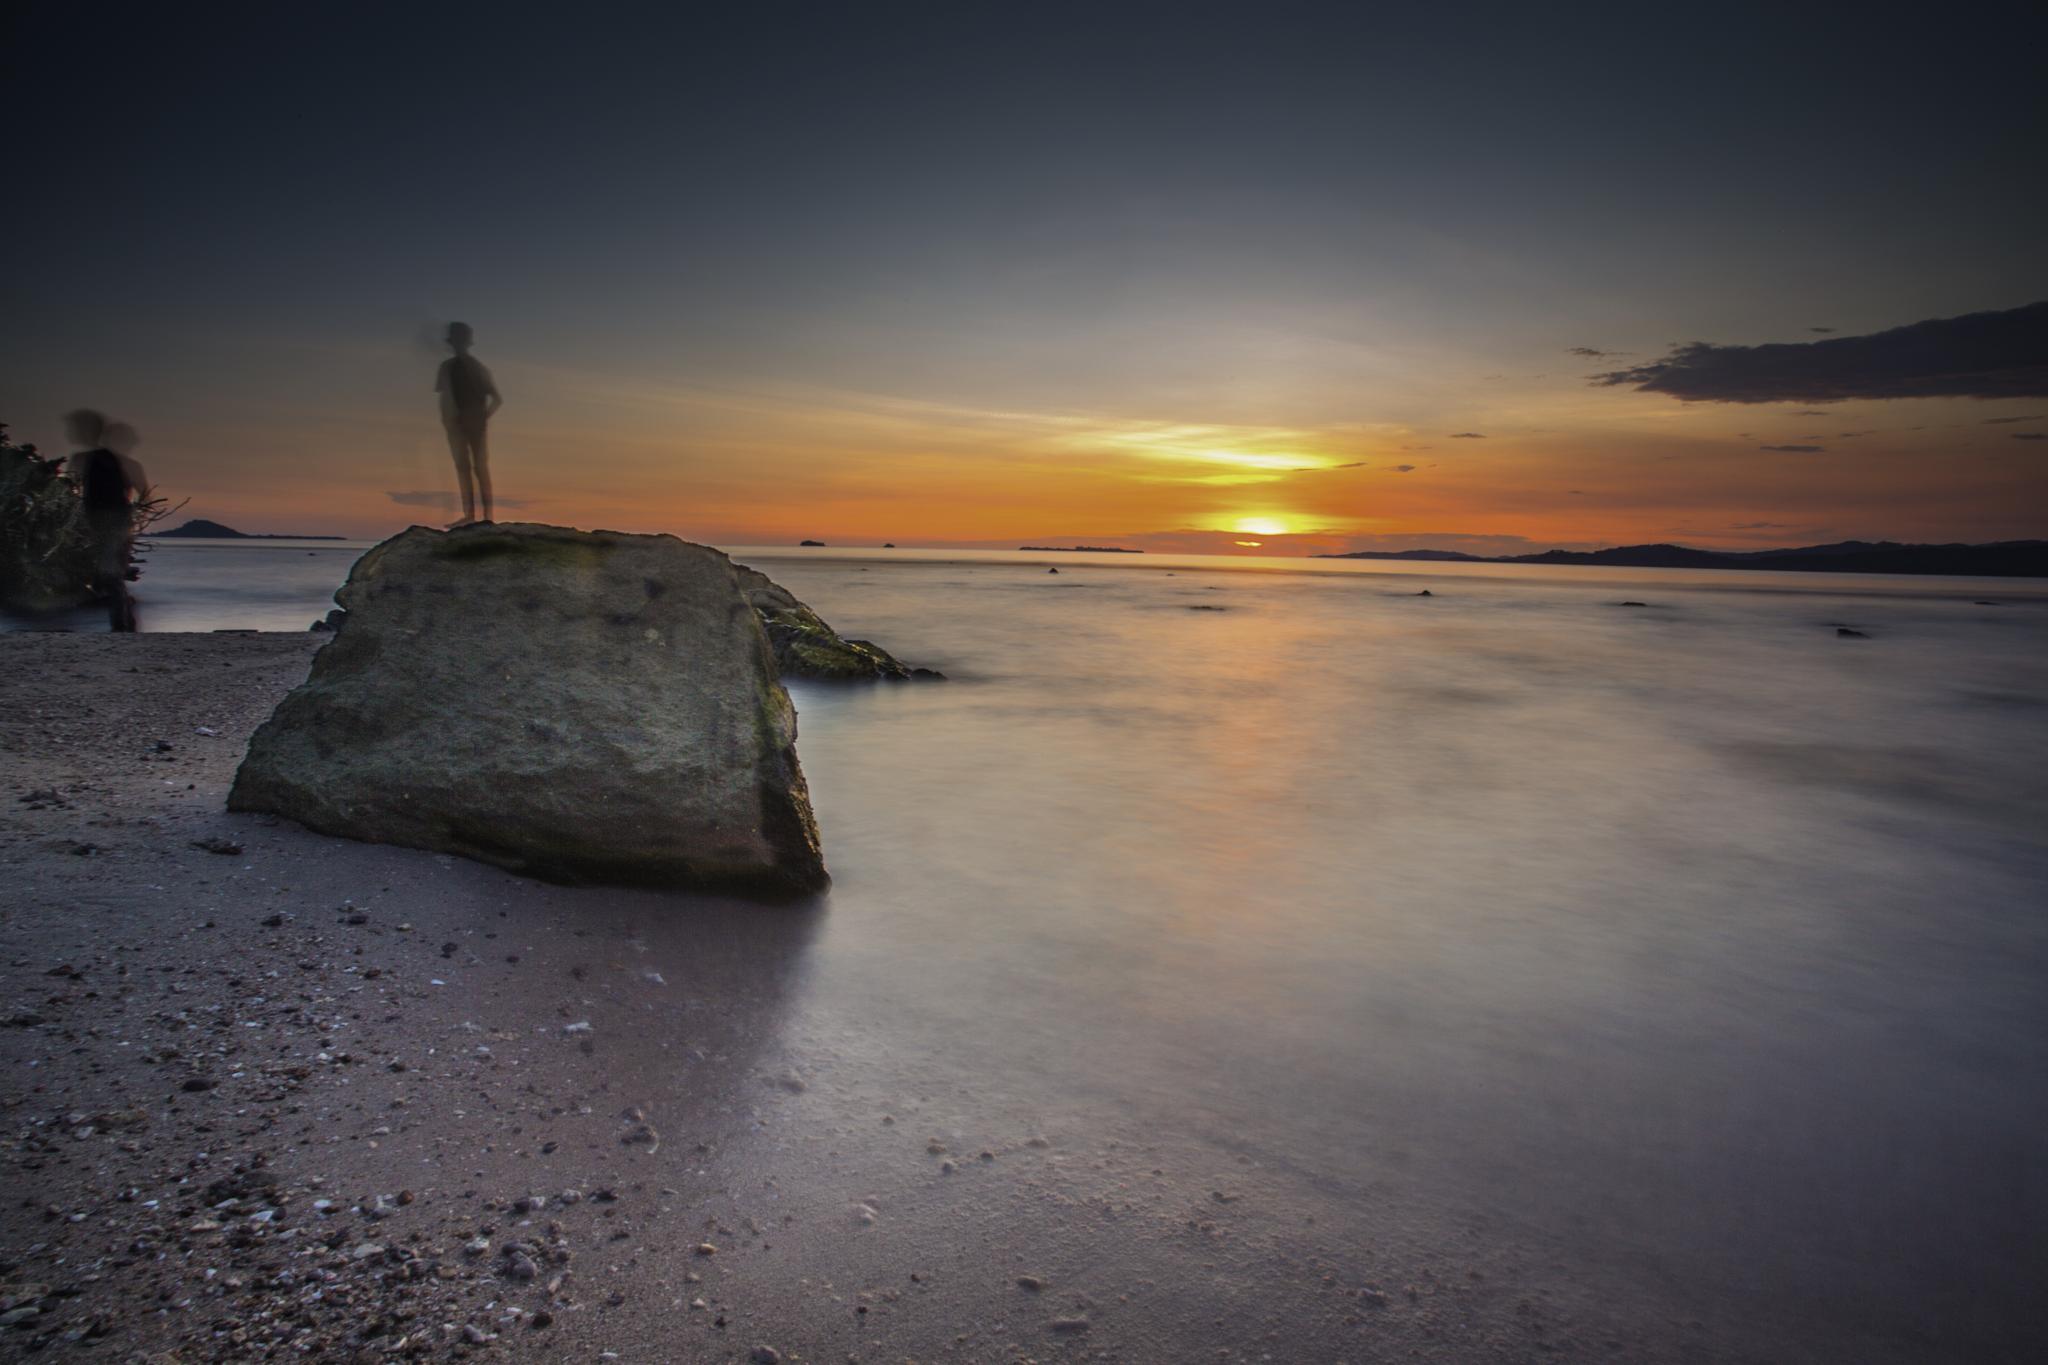 Senja di Pantai Carocok by Syafri Gamal